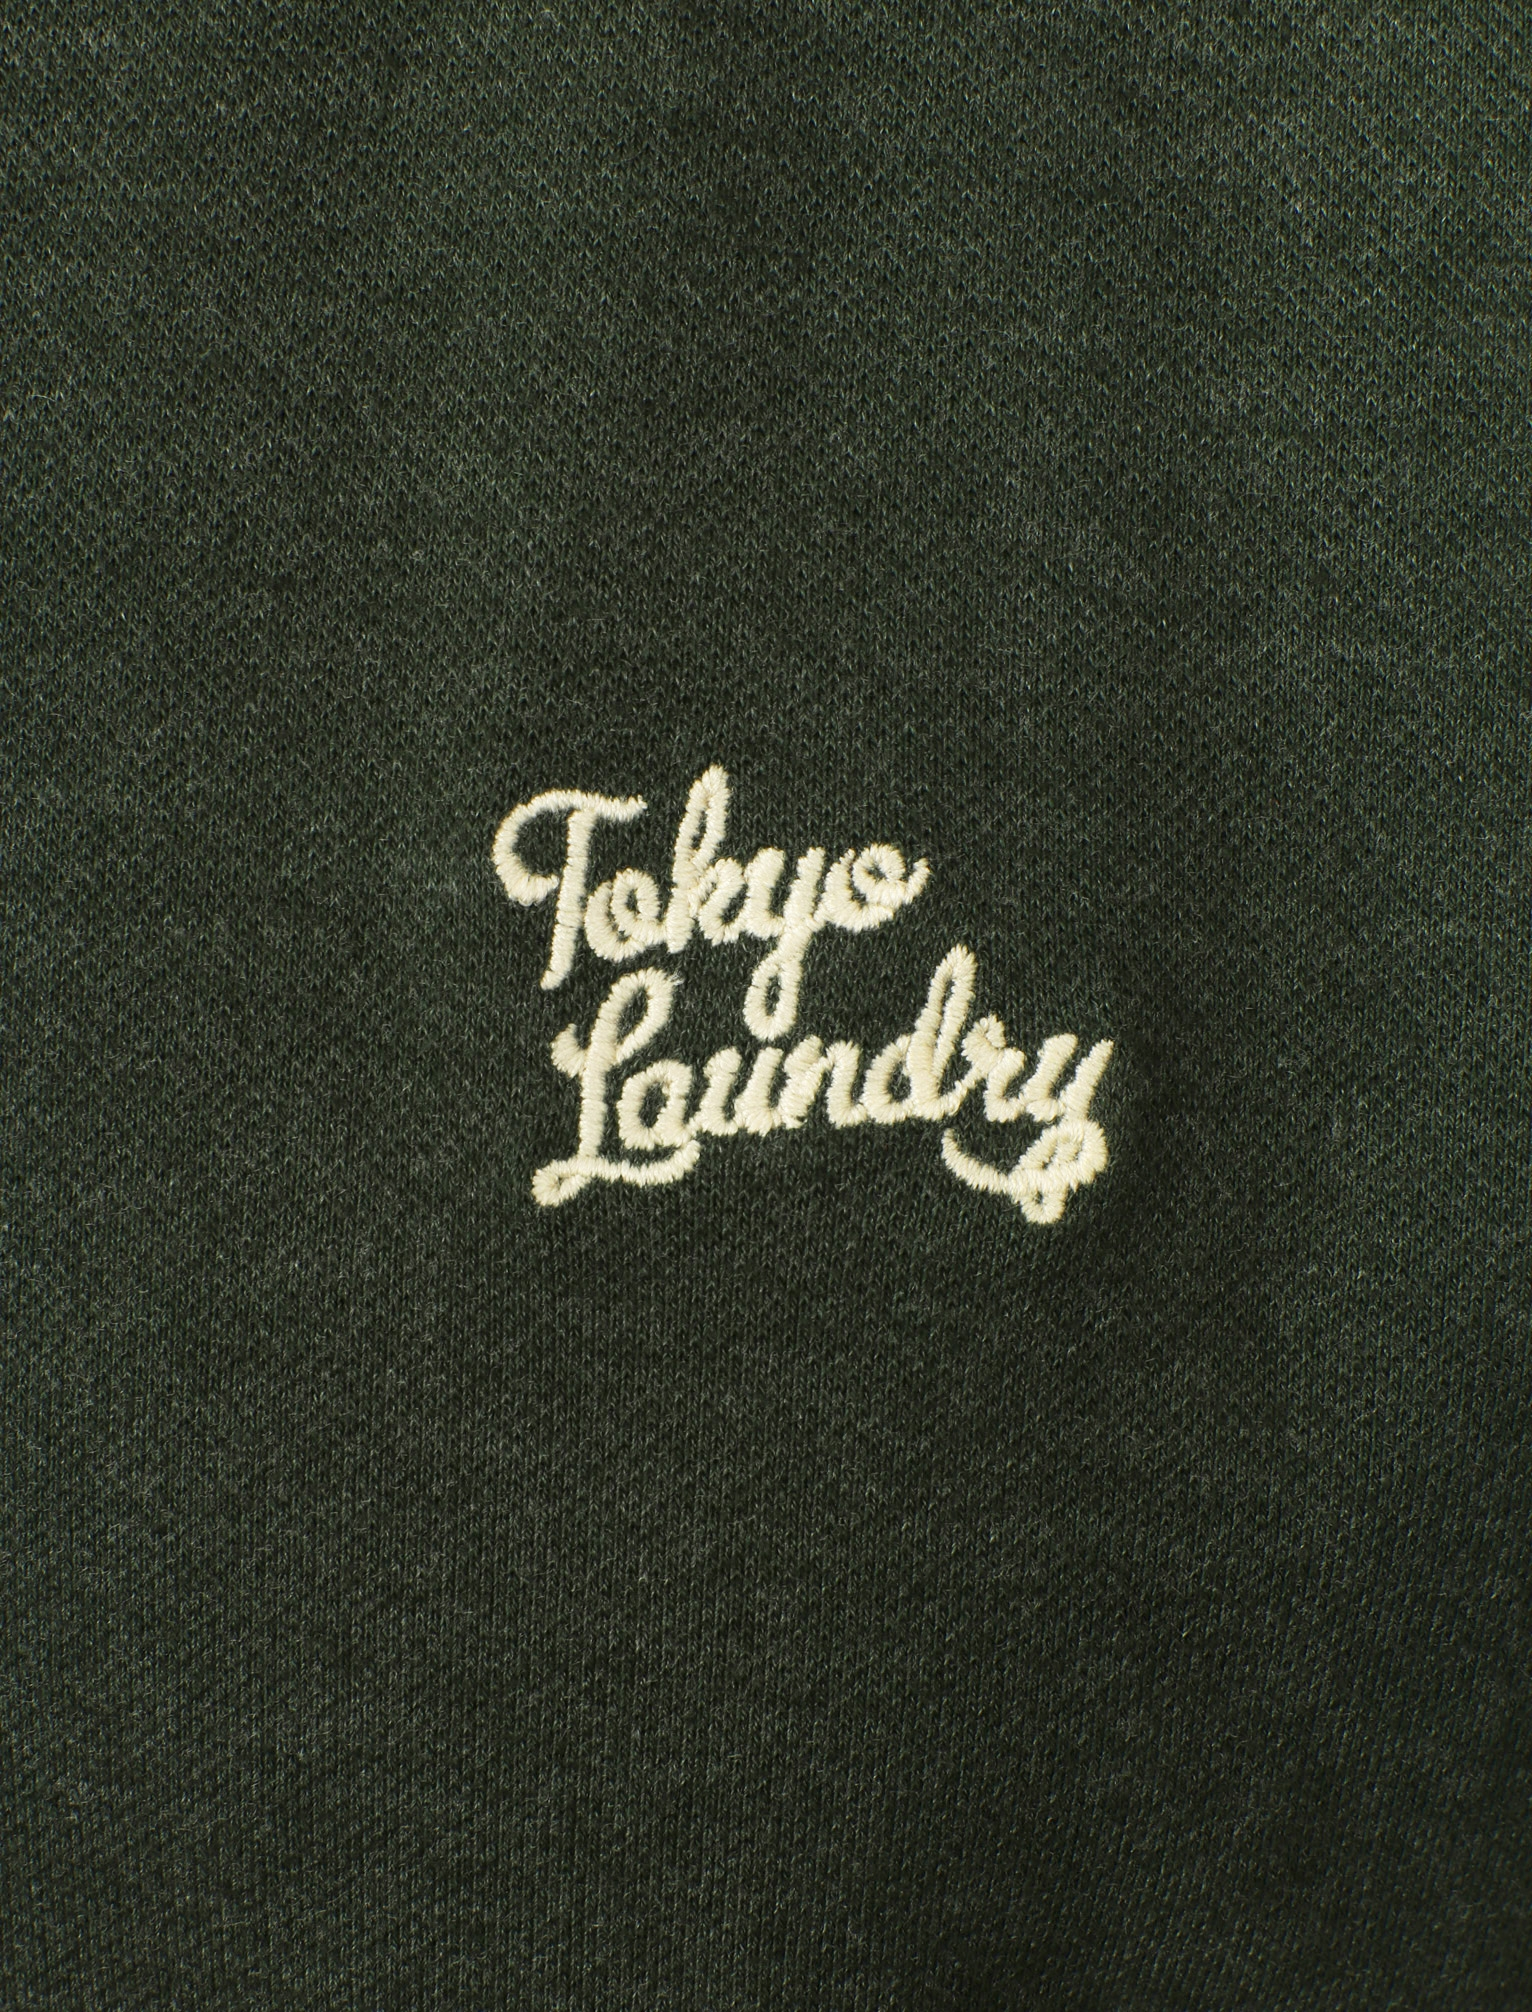 New-Mens-Tokyo-Laundry-Branded-Kuusamo-Cotton-Rich-Pique-Polo-Shirt-Size-S-XXL thumbnail 29